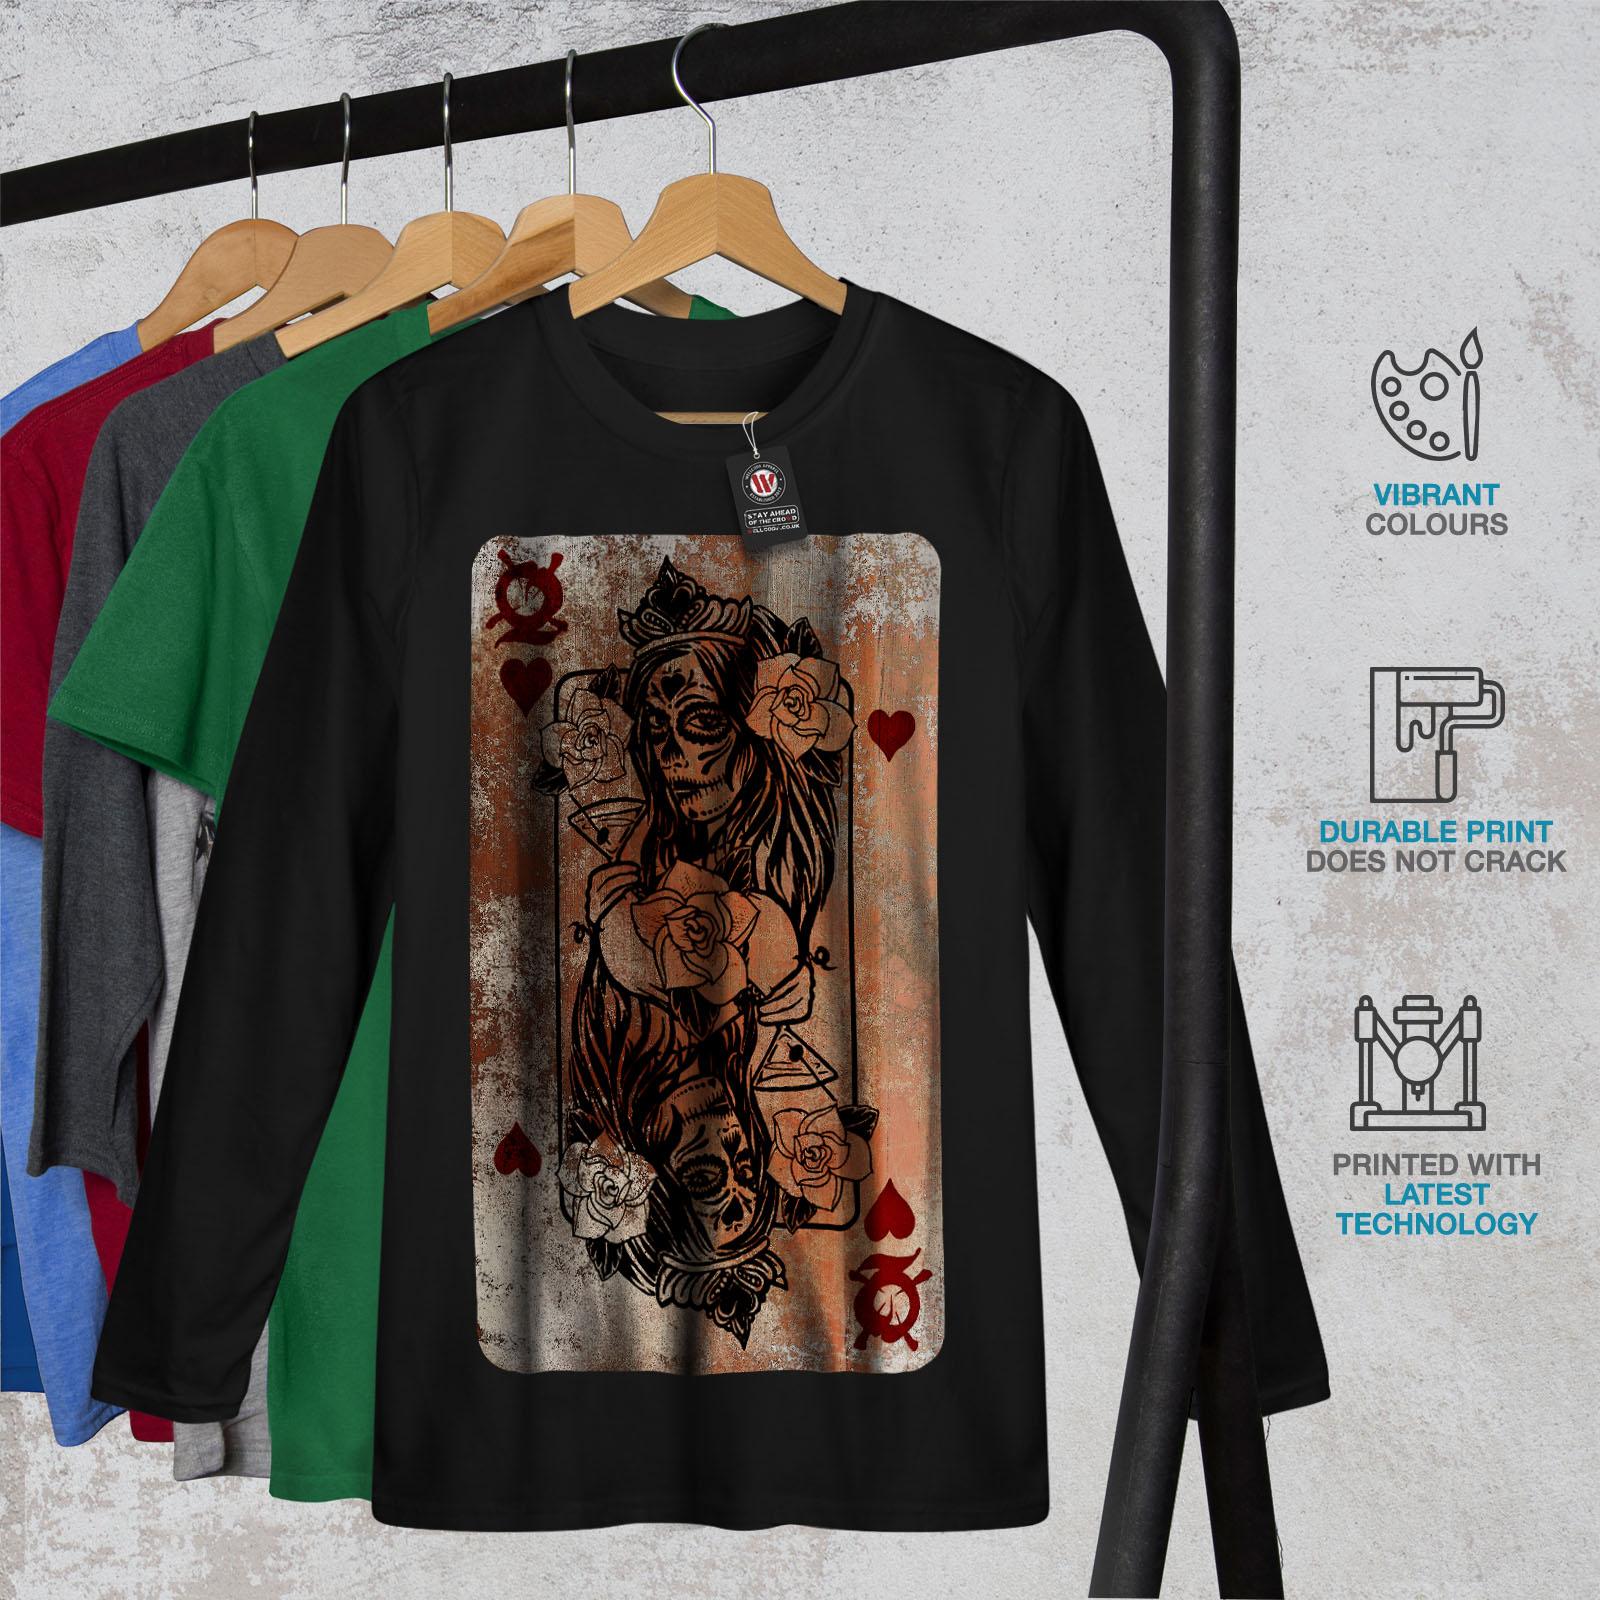 Gothic Heart Queen Men Sweatshirt NEWWellcoda